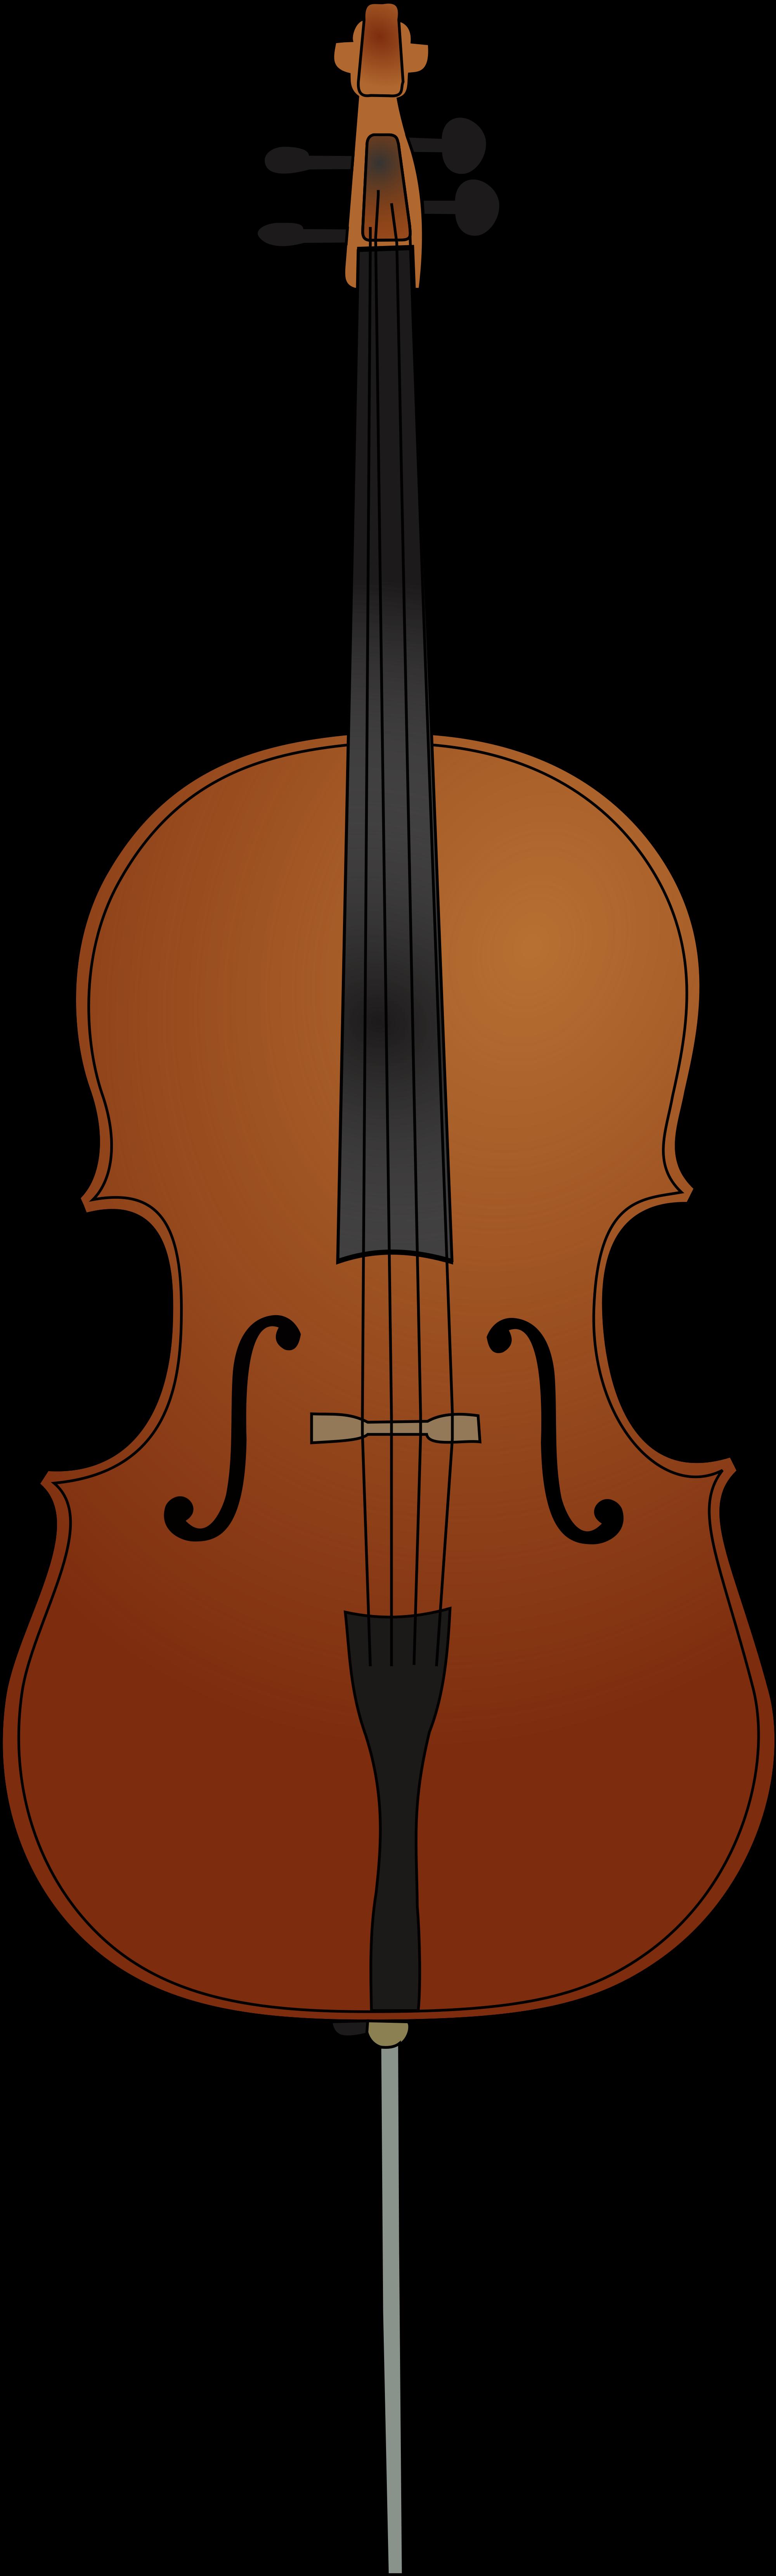 Instruments clipart cello, Instruments cello Transparent.